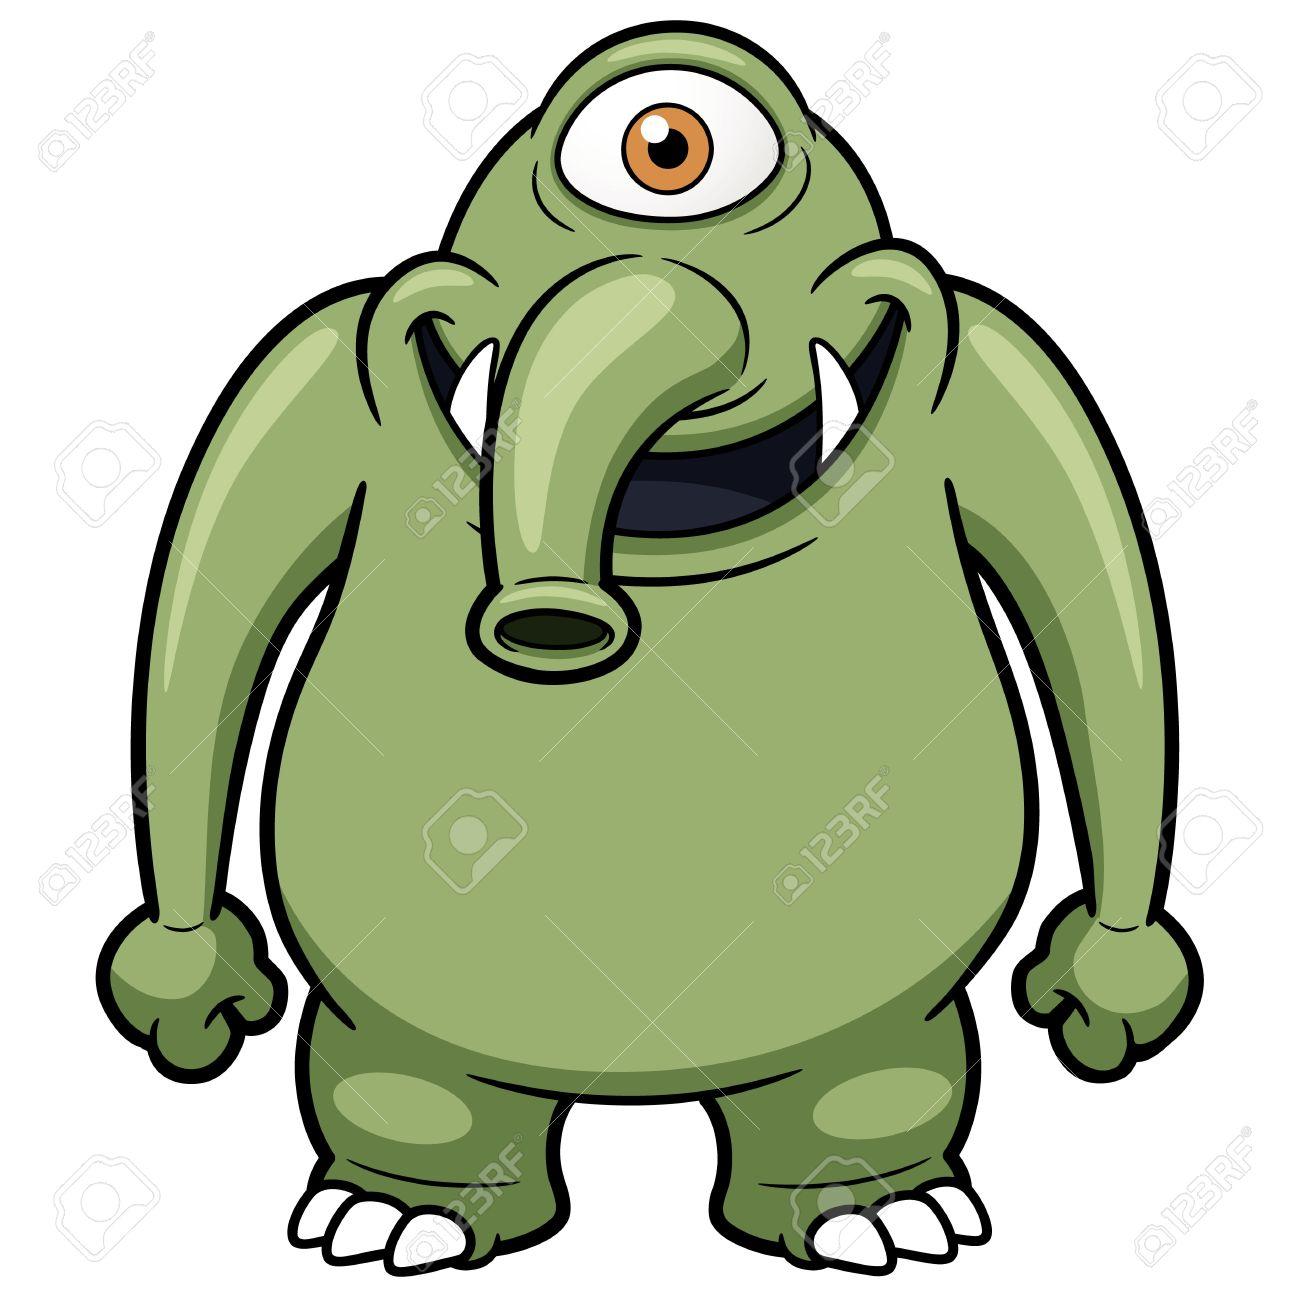 vector illustration of cartoon monster royalty free cliparts